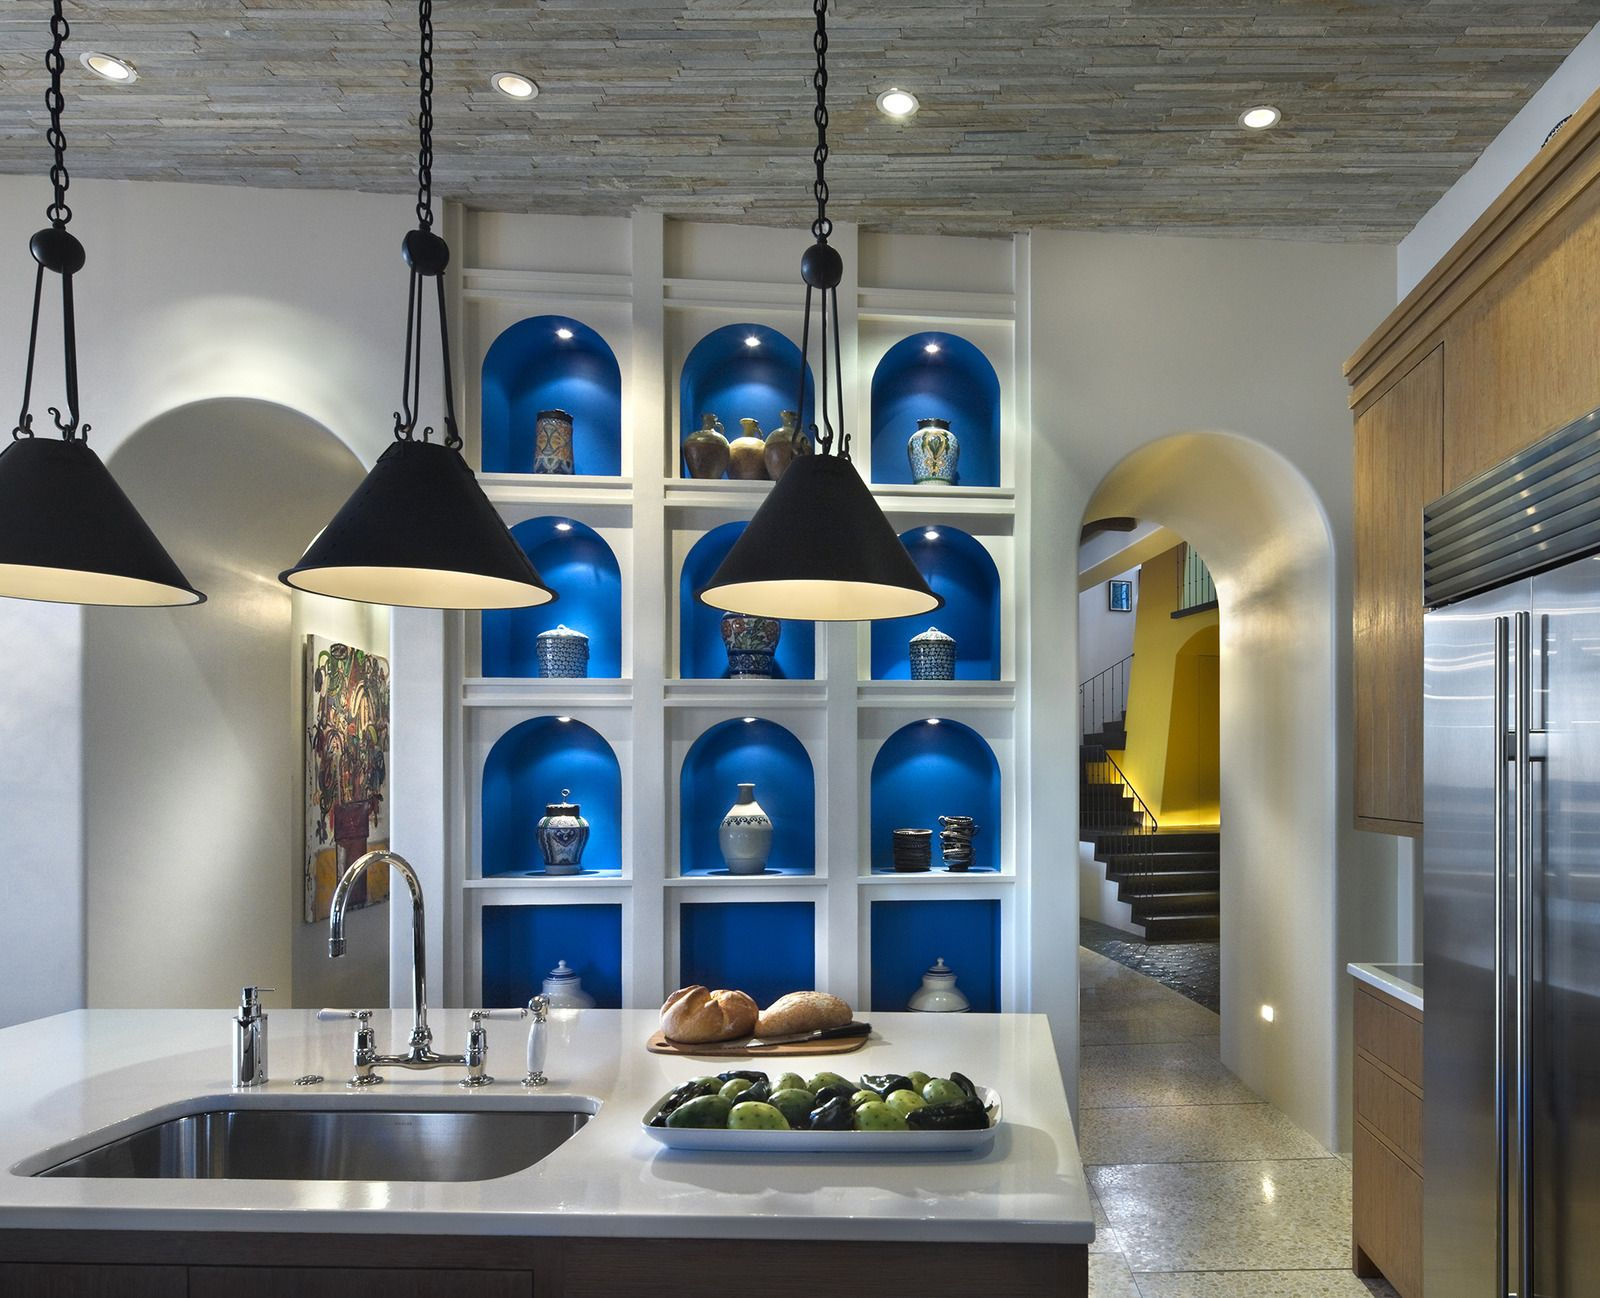 Ike kligerman barkley ikb is an architecture and interior design